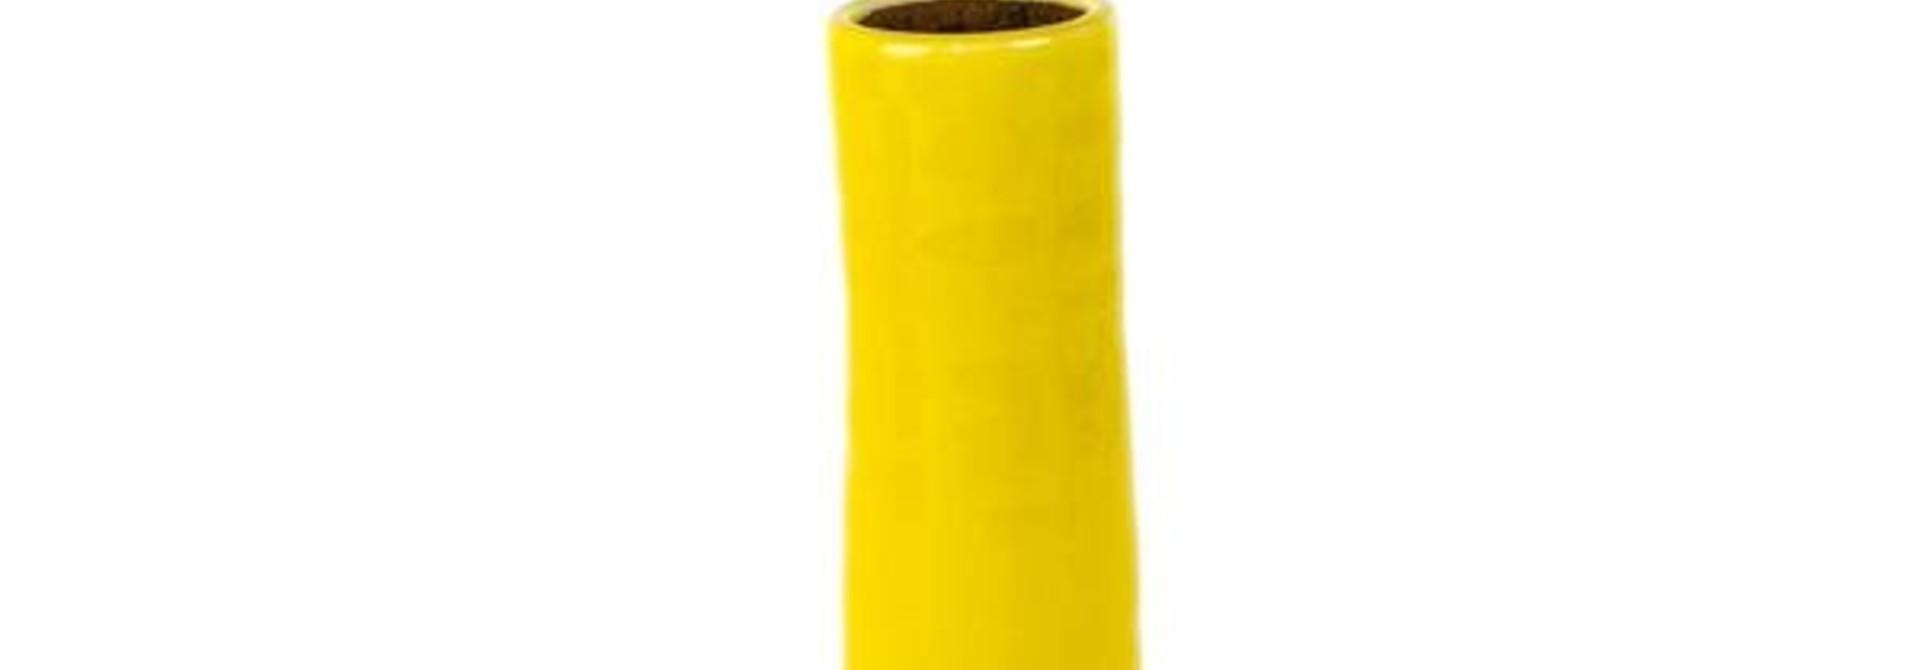 Vase -  Ma-To - Small - Citron